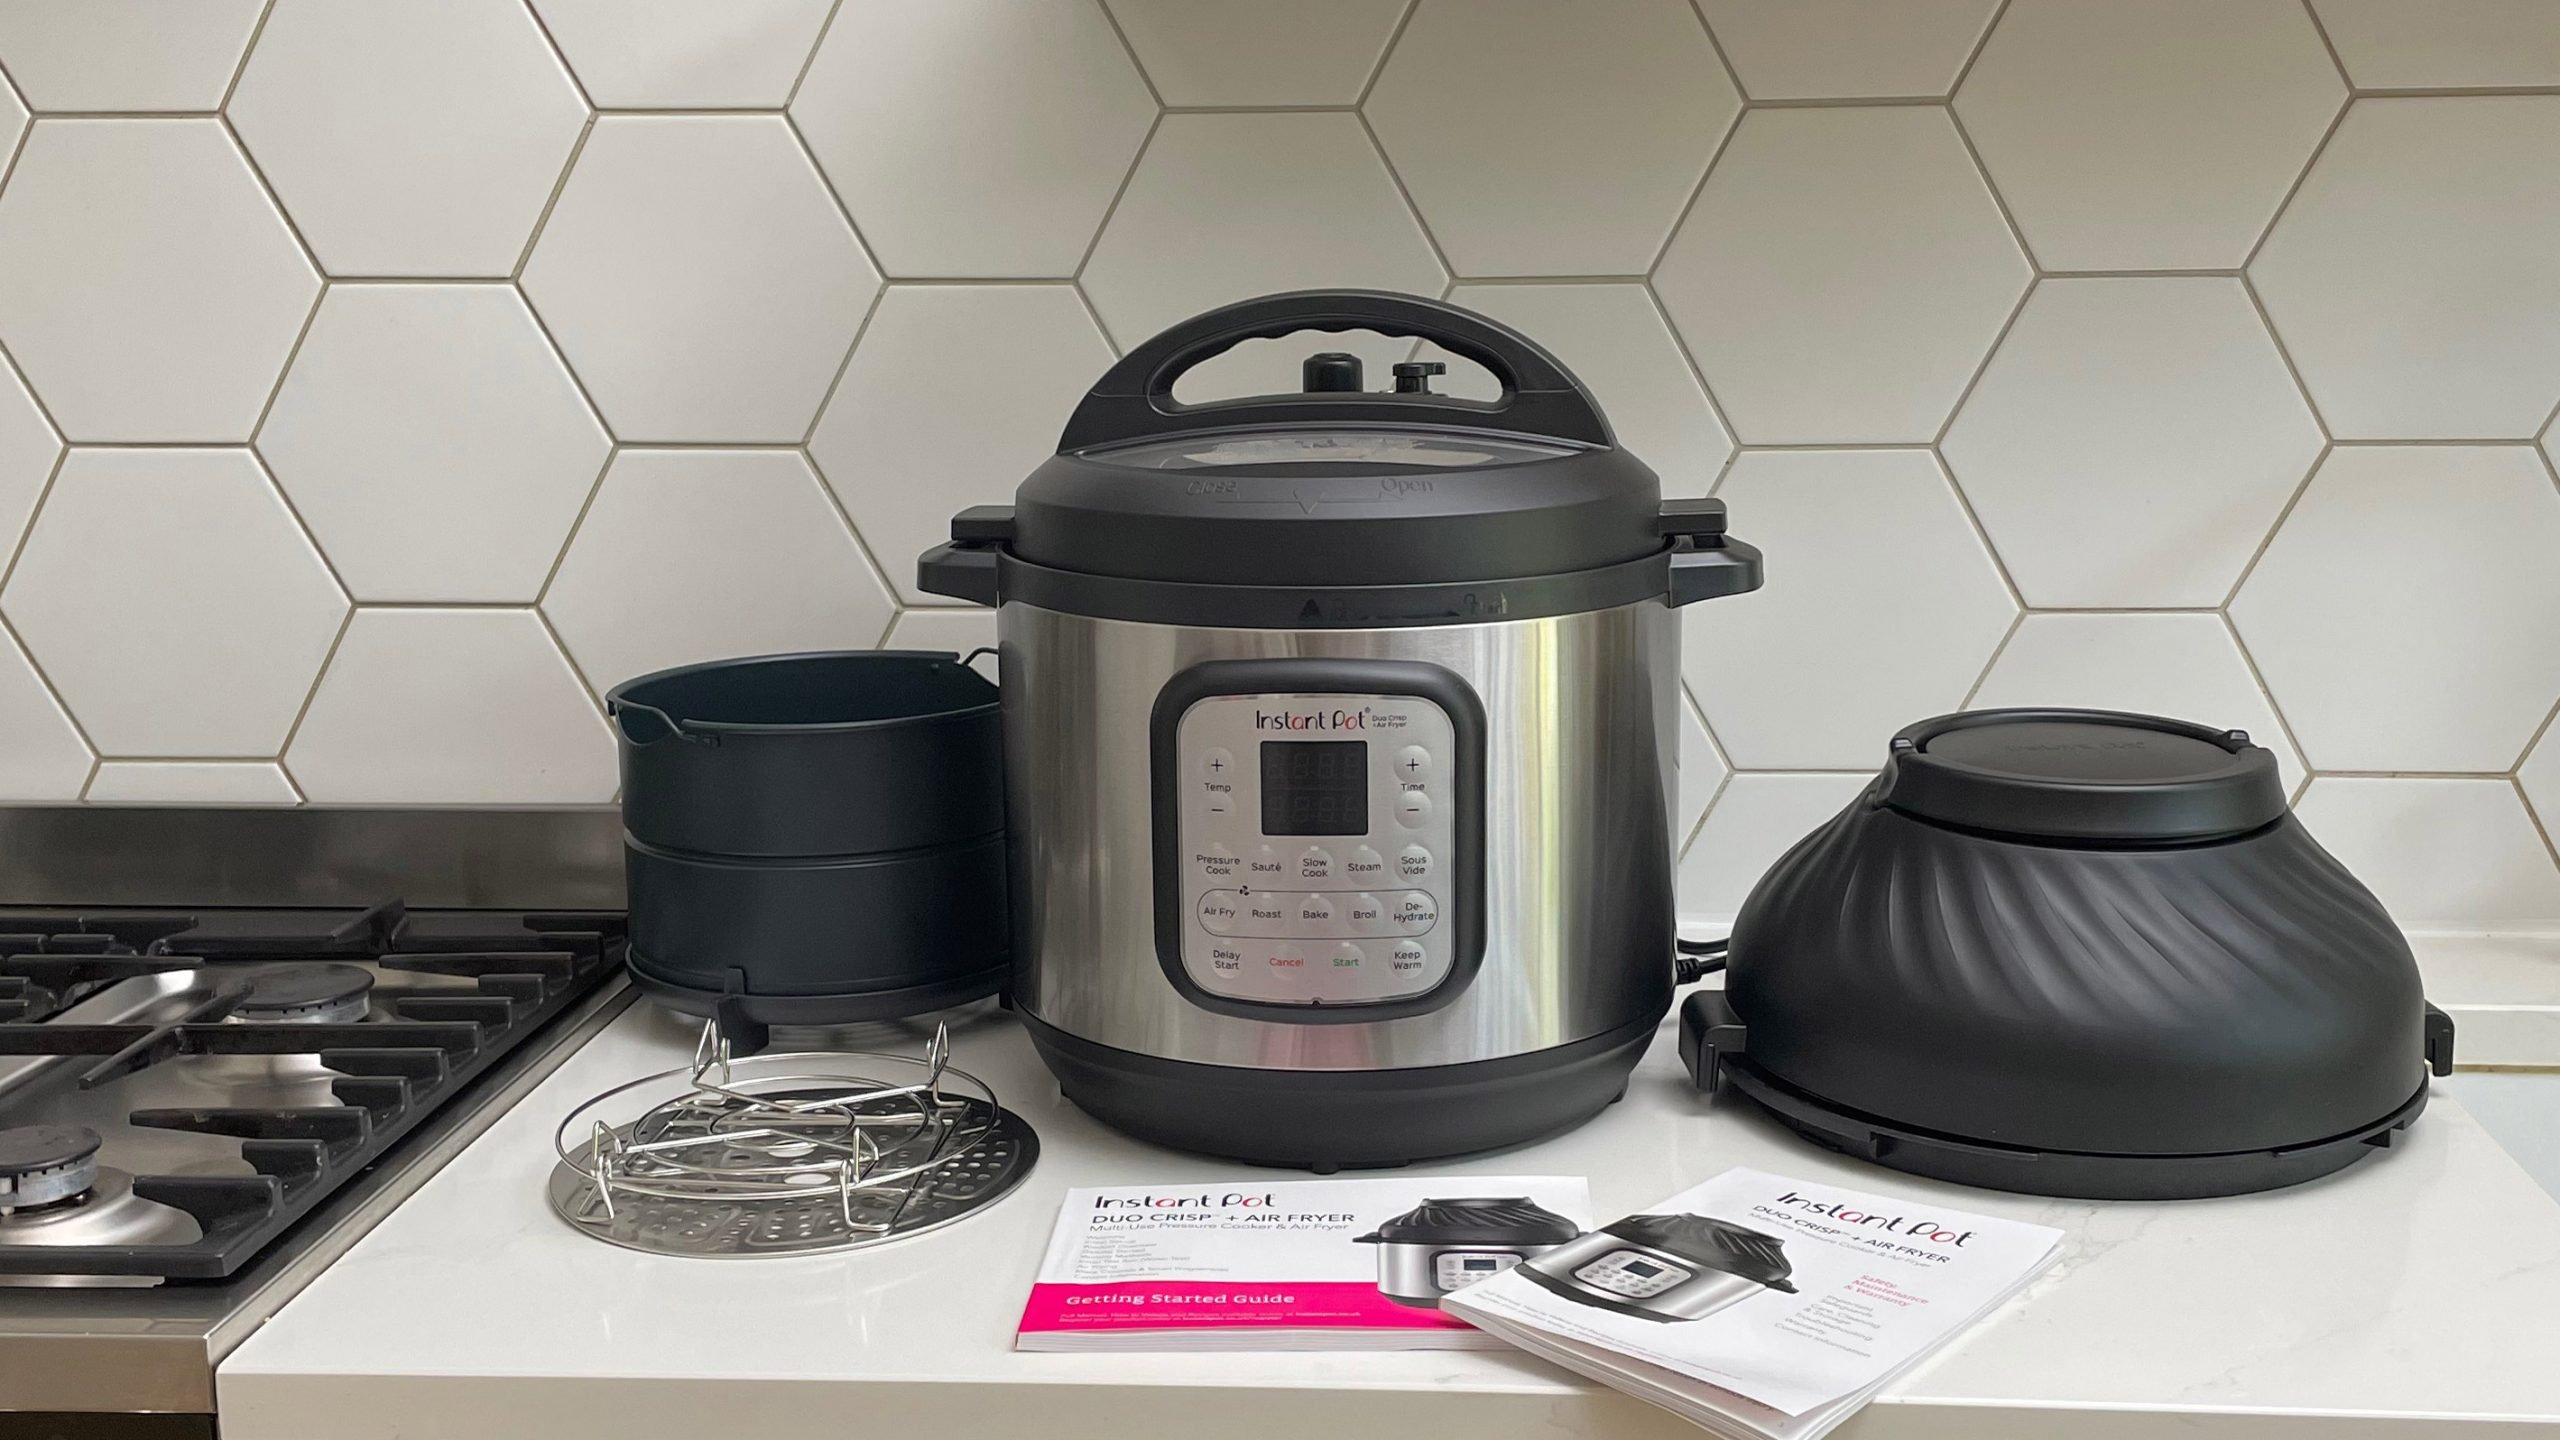 Instant Pot Duo Crisp & Air Fryer on a kitchen countertop